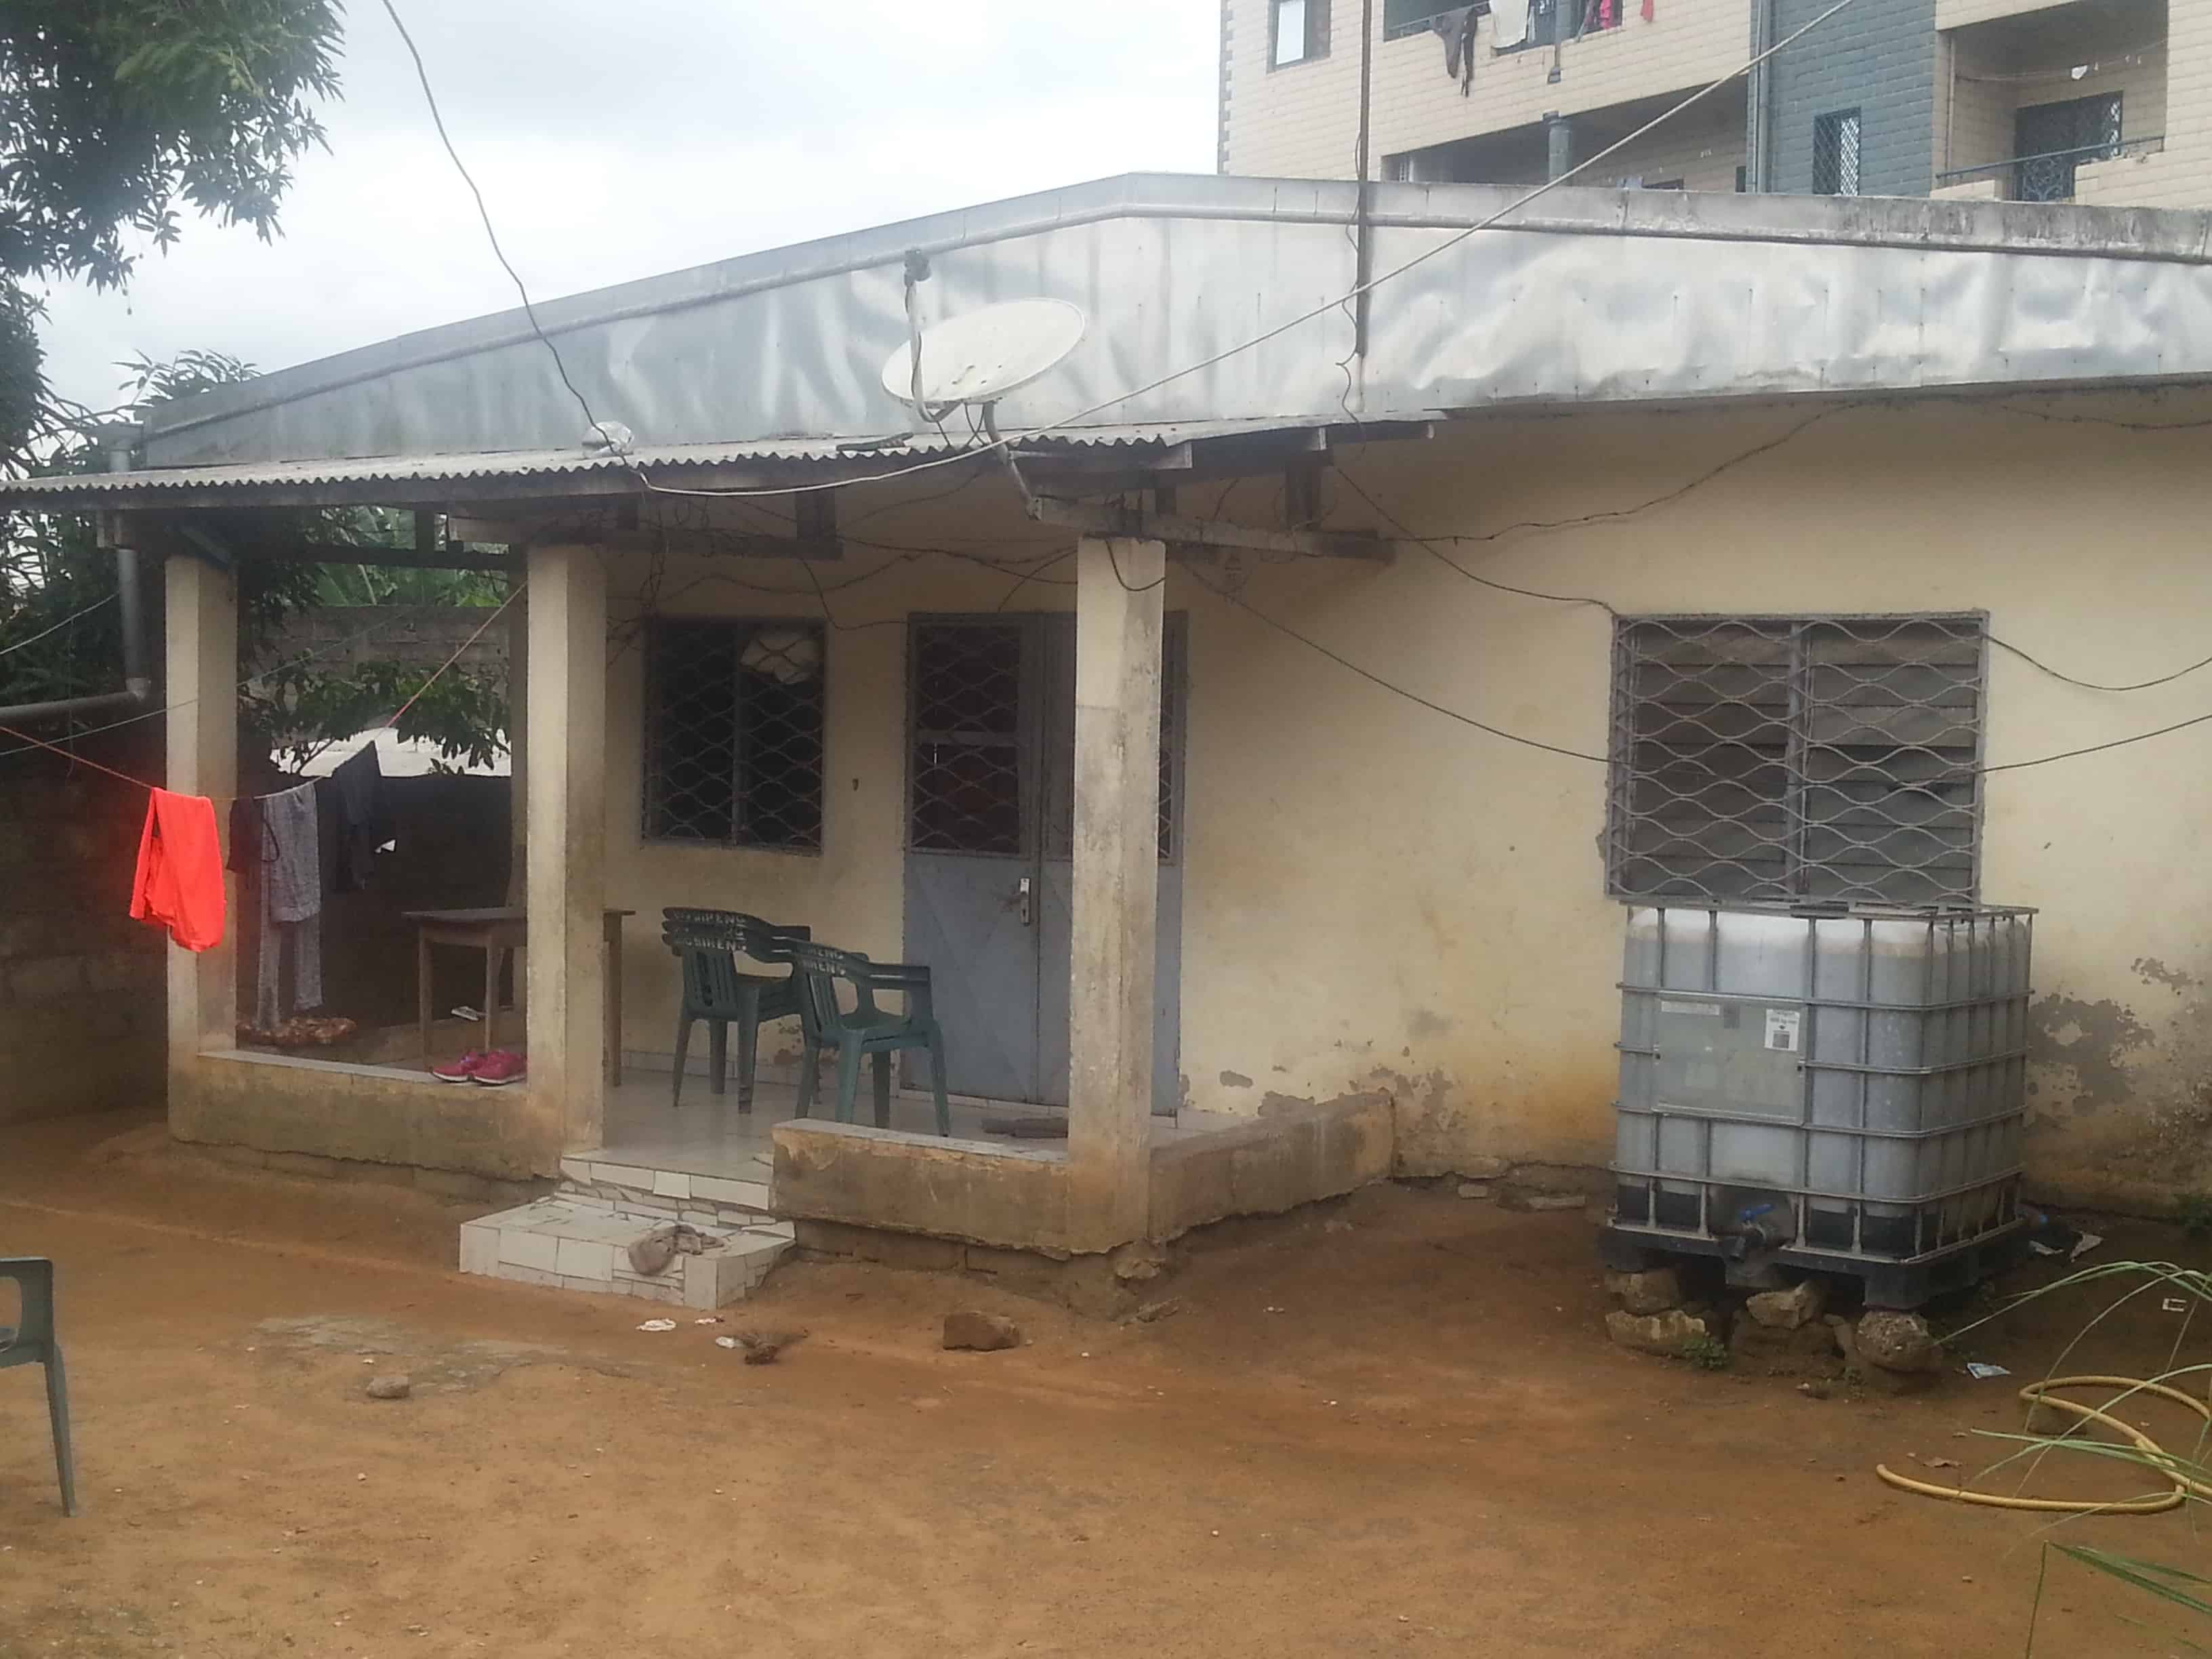 House (Villa) for sale - Douala, Cite Ubo Palmiers, Lycée - 1 living room(s), 3 bedroom(s), 2 bathroom(s) - 16 000 000 FCFA / month